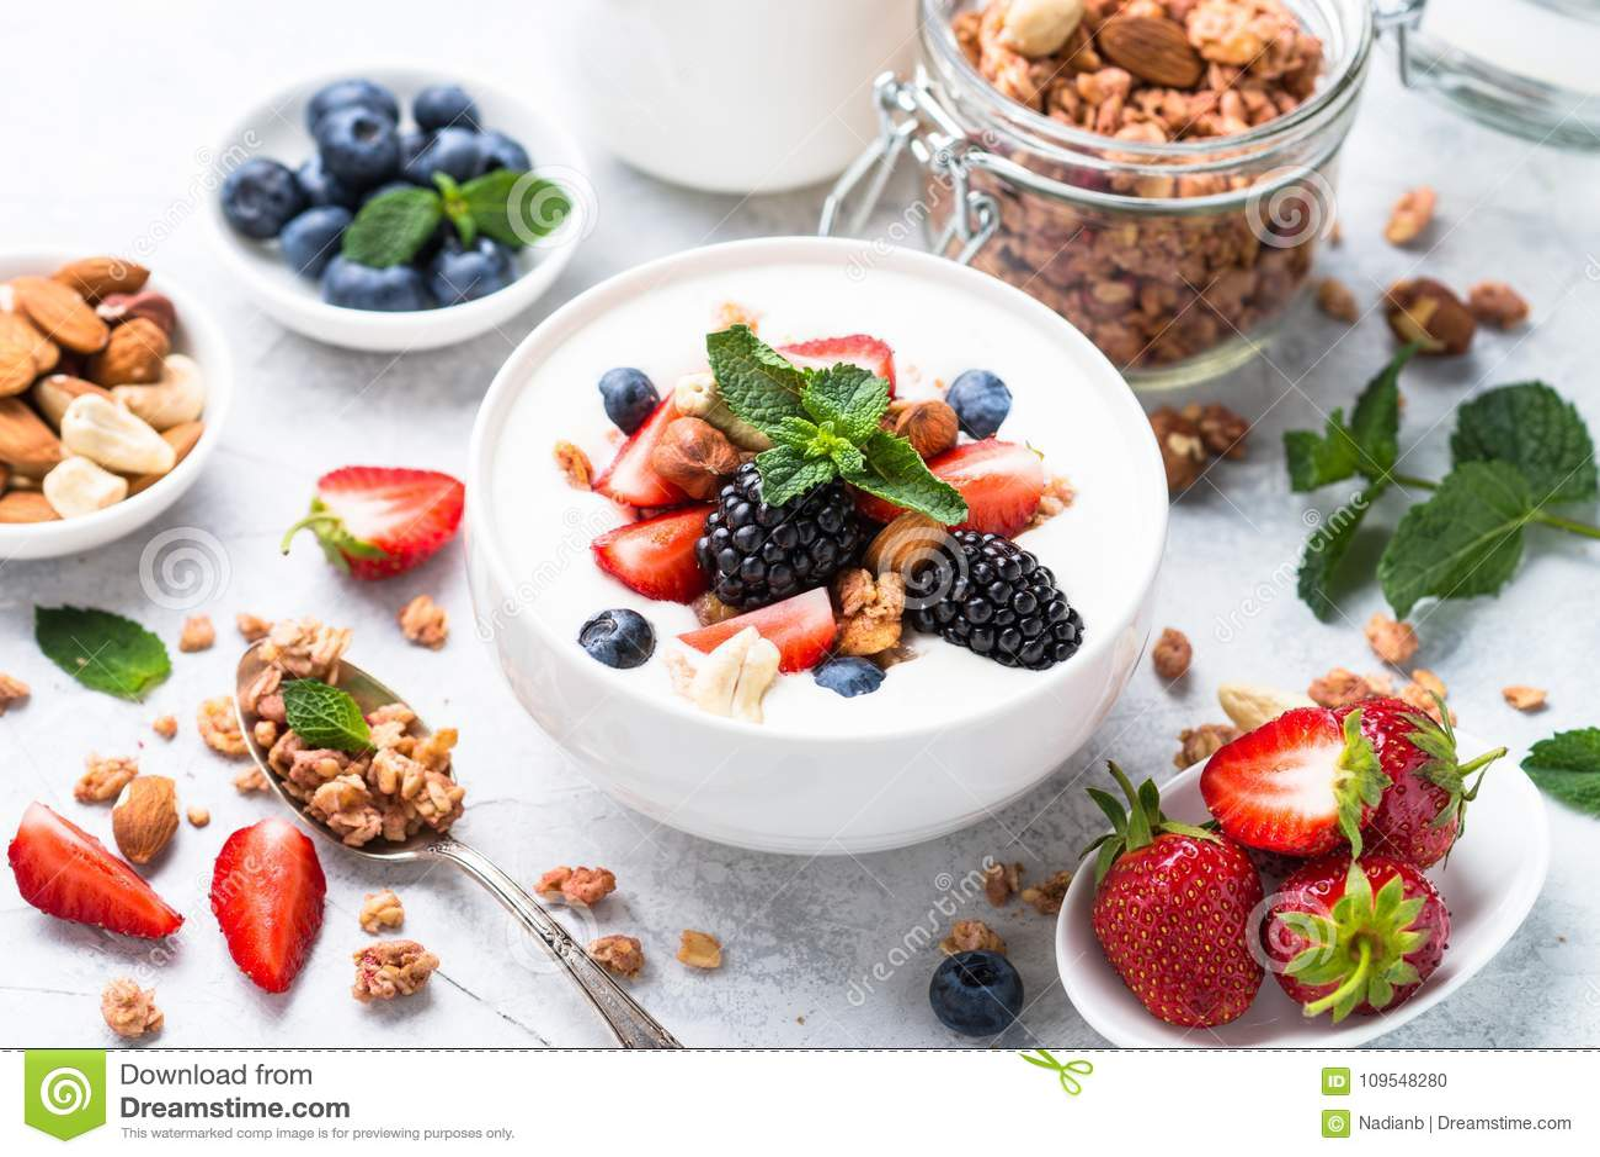 Greek yogurt granola and berry mix.